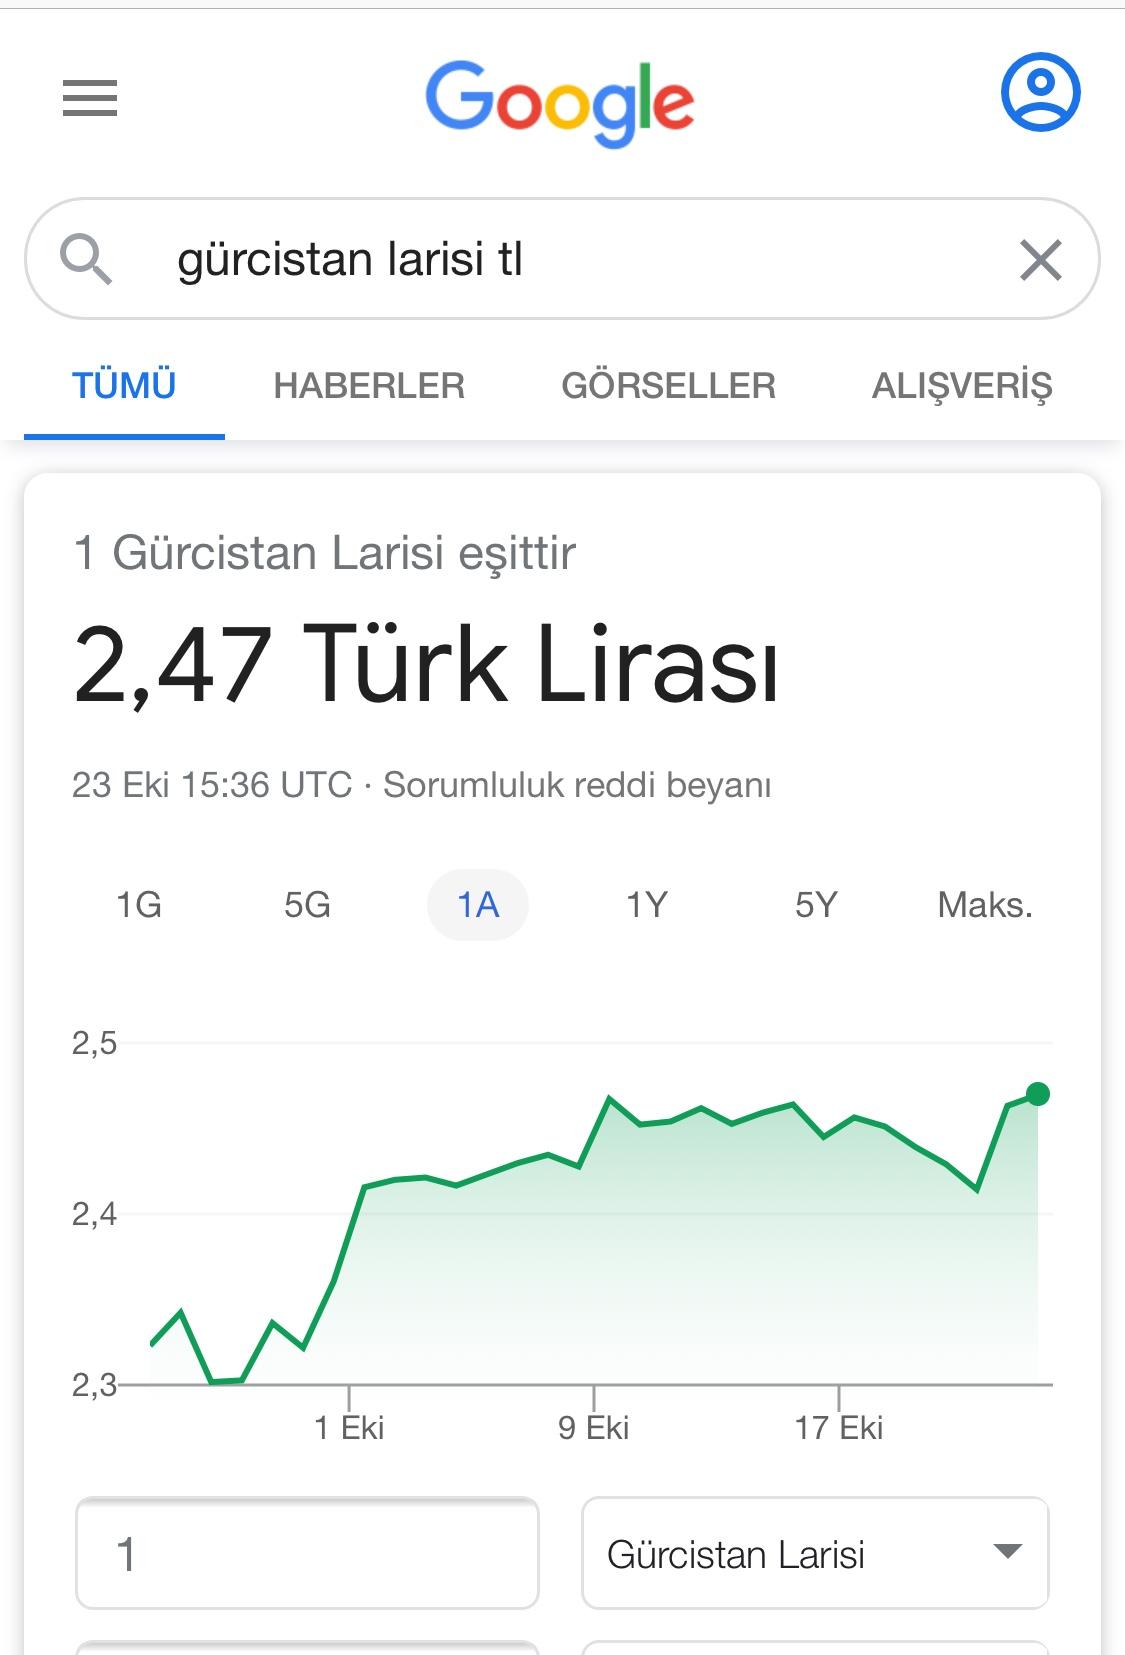 1 gürcistan larisi nin 2 lira 47 kuruş olması